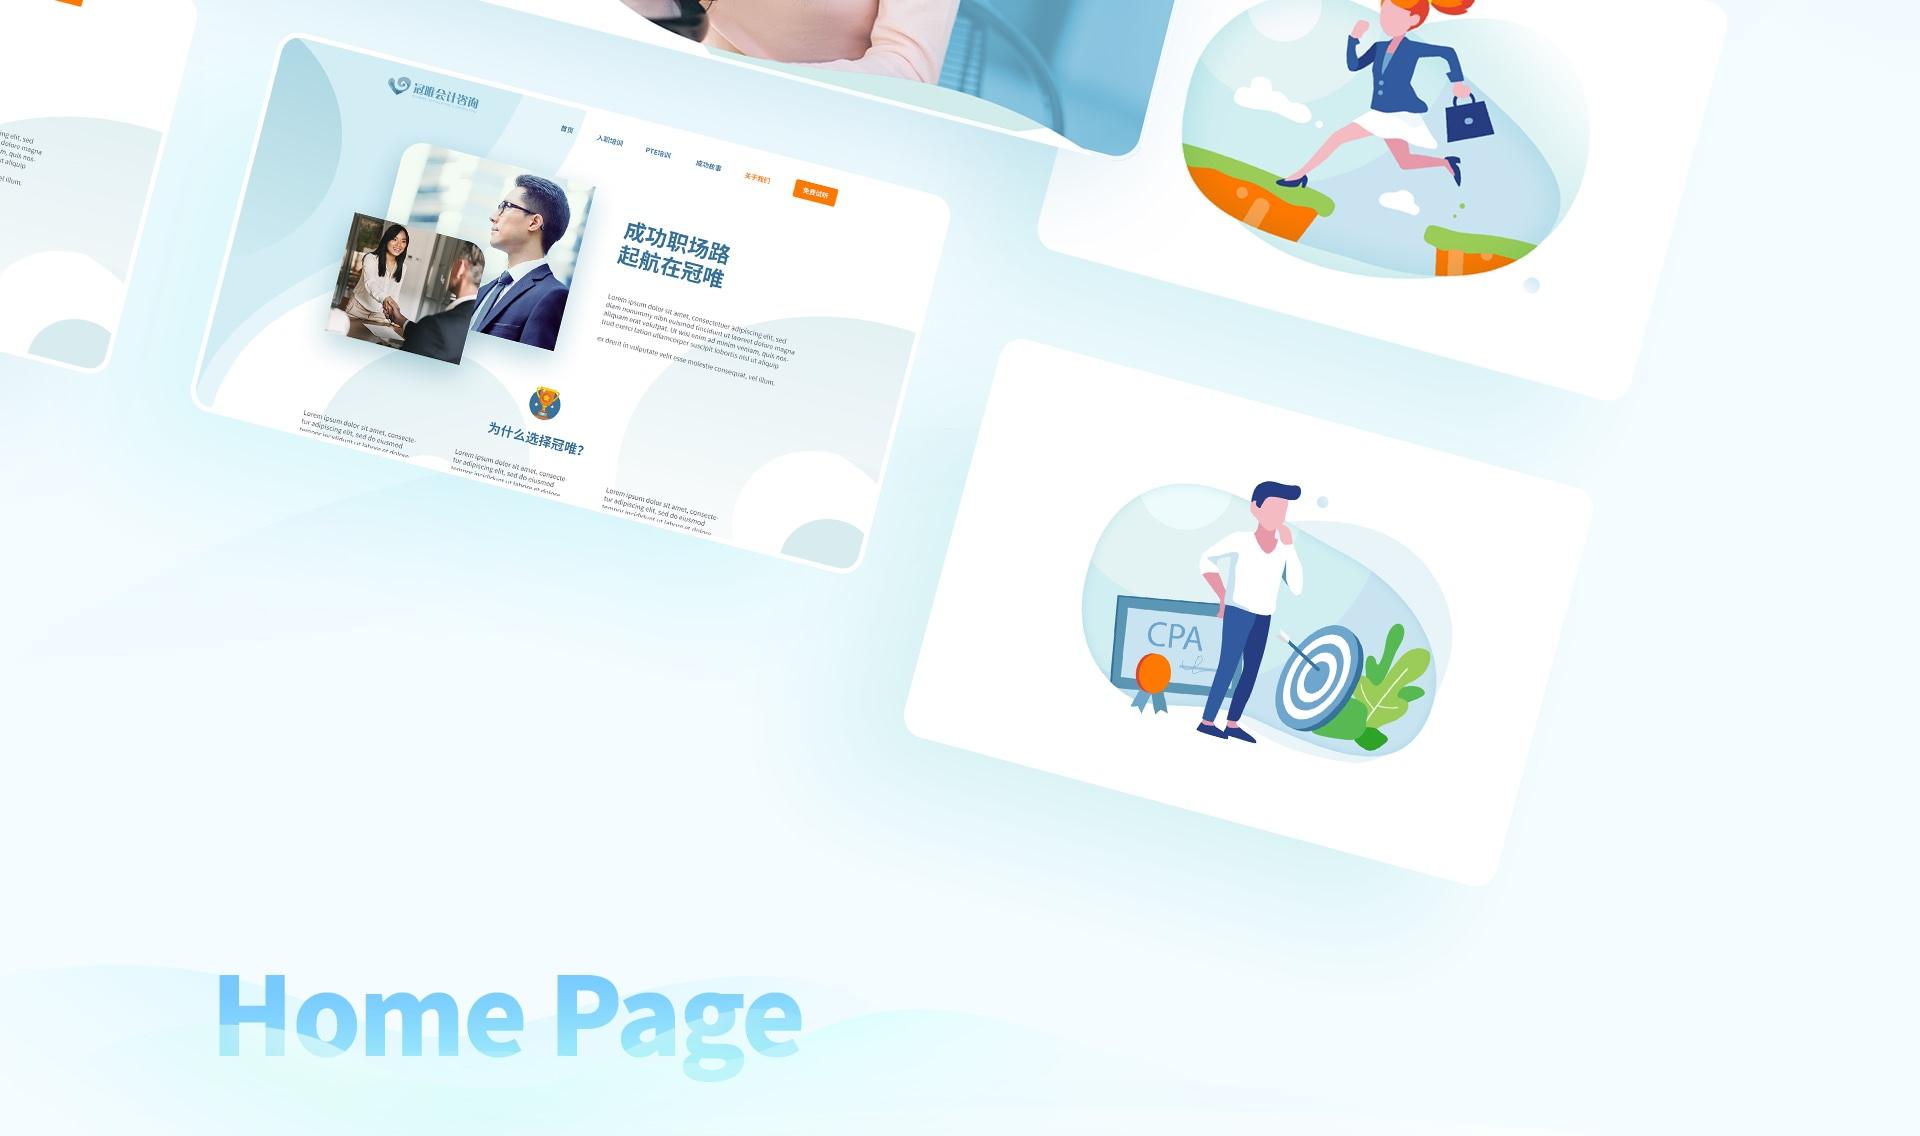 Guanwei Accounting web design by Z Creative Studio Branding & Graphic Design Melbourne